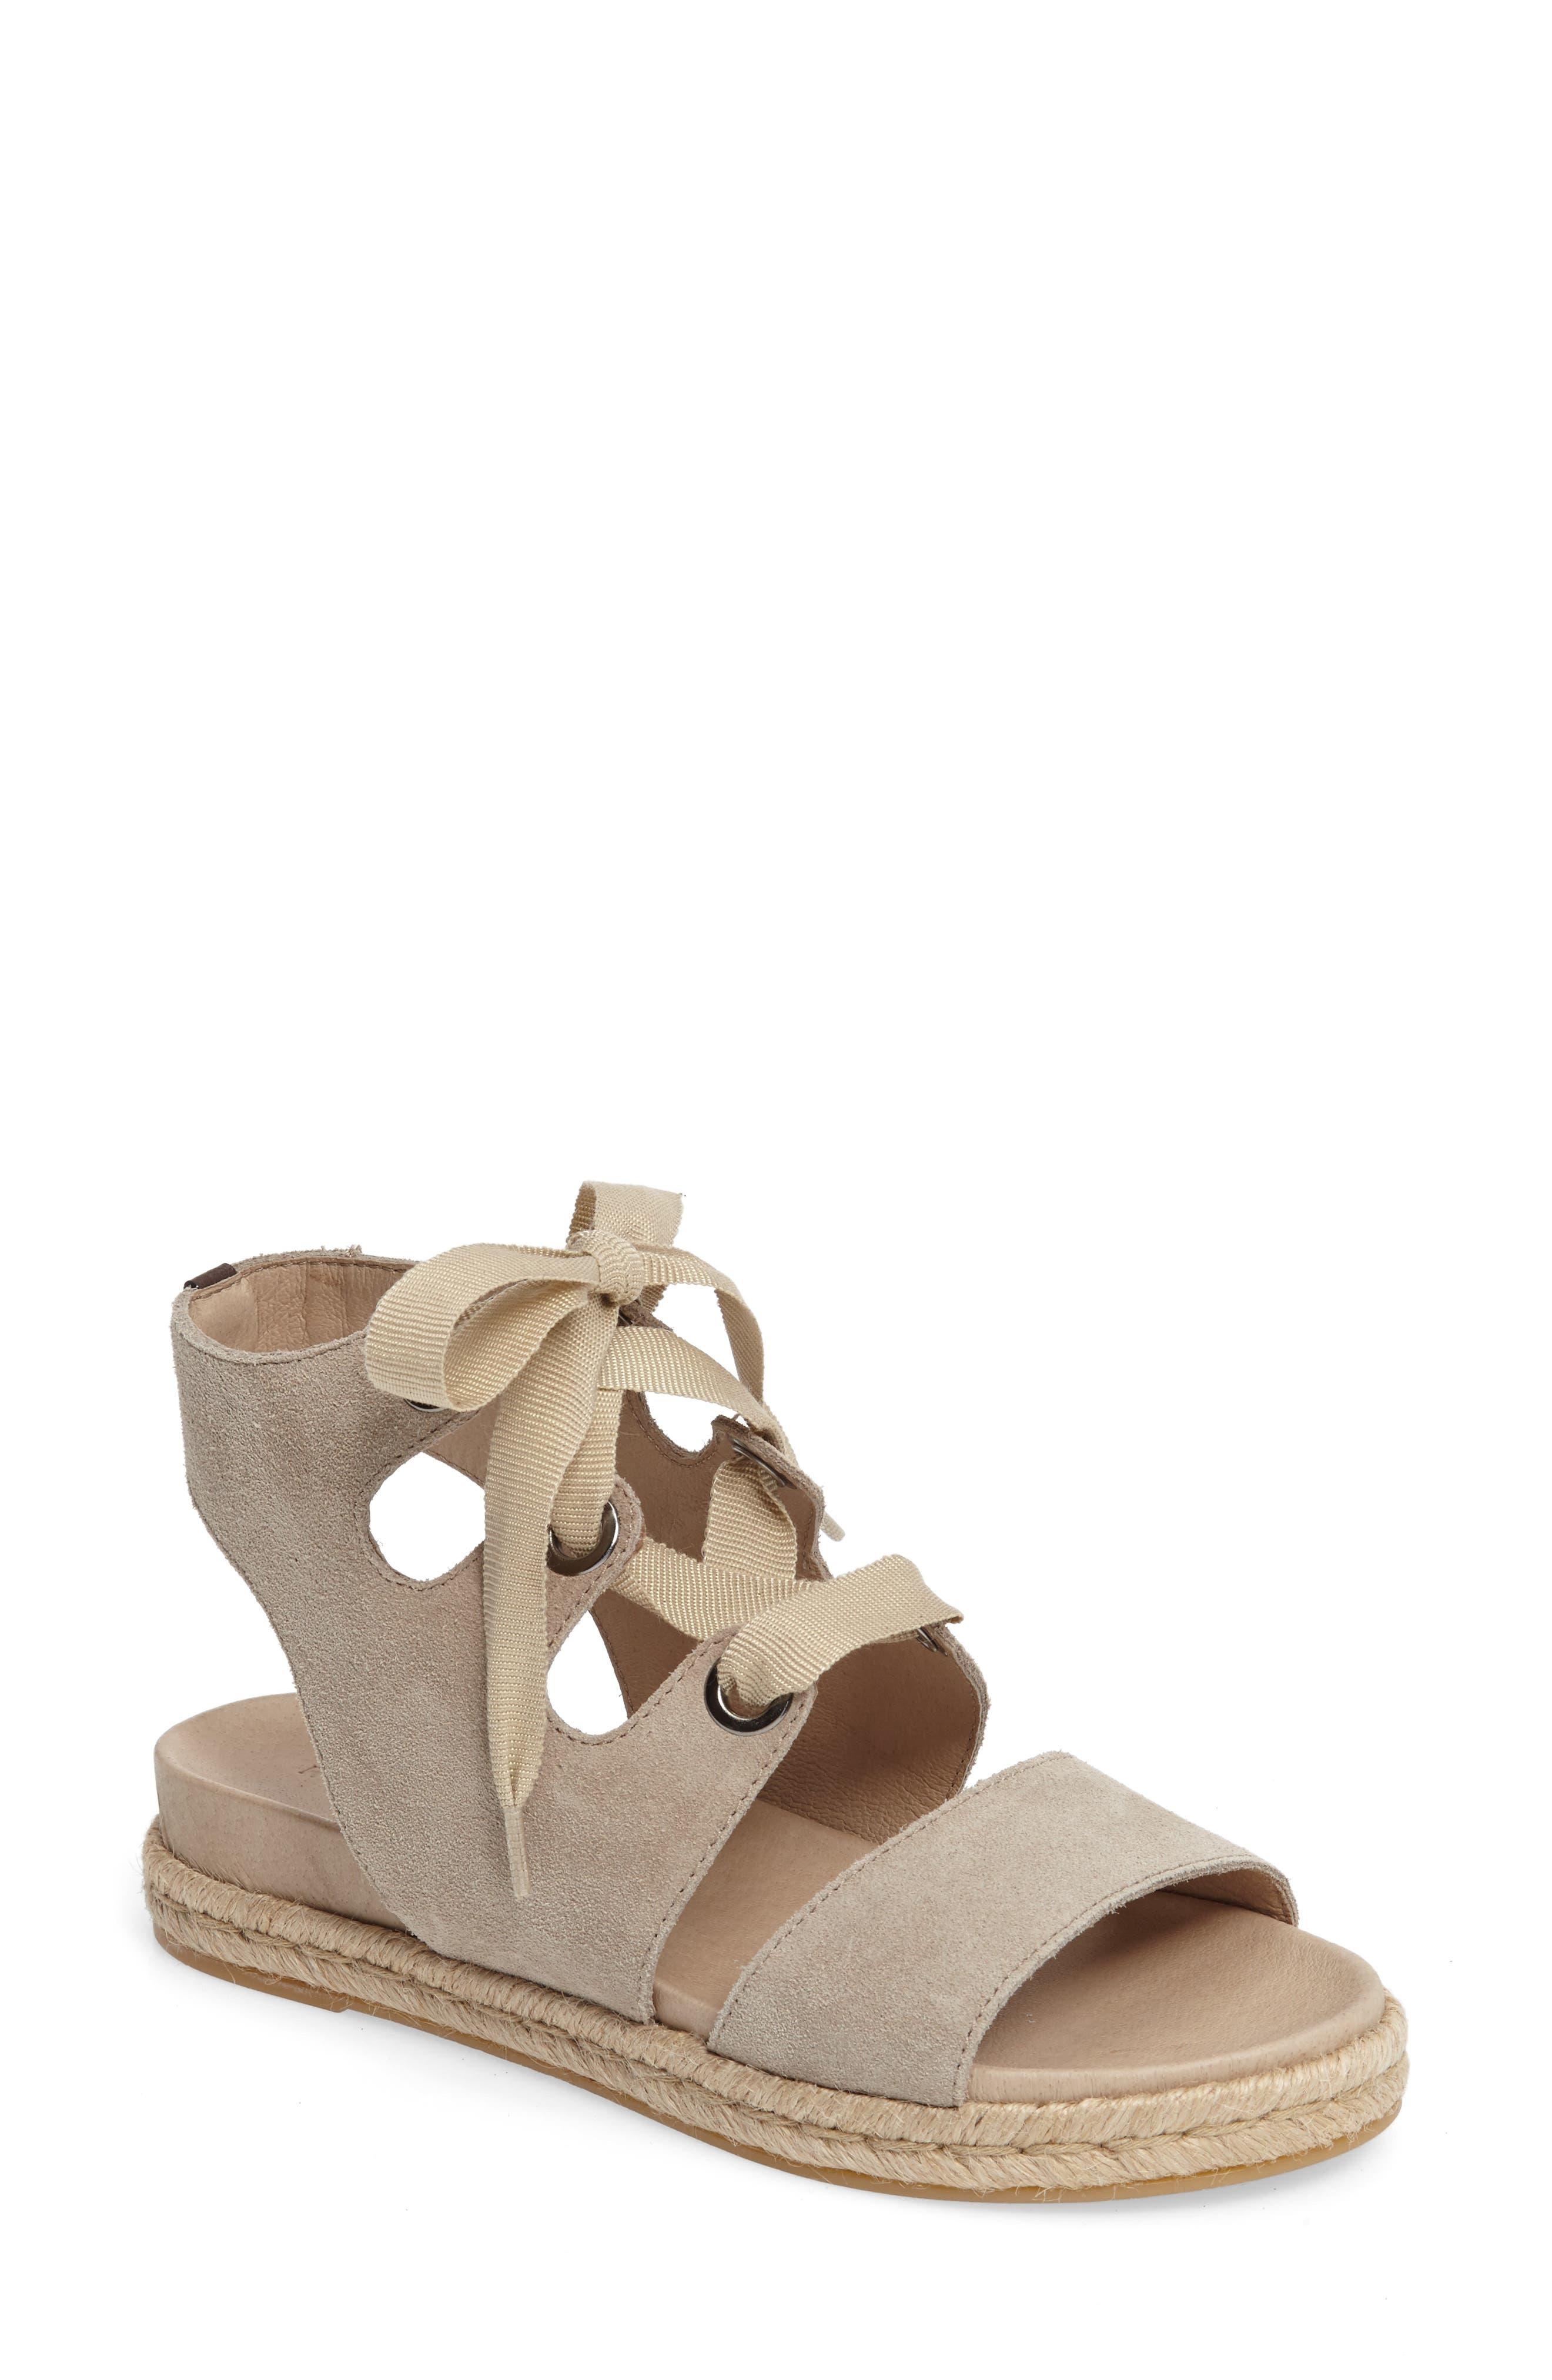 Alternate Image 1 Selected - Rudsak Baptista Lace-Up Sandal (Women)